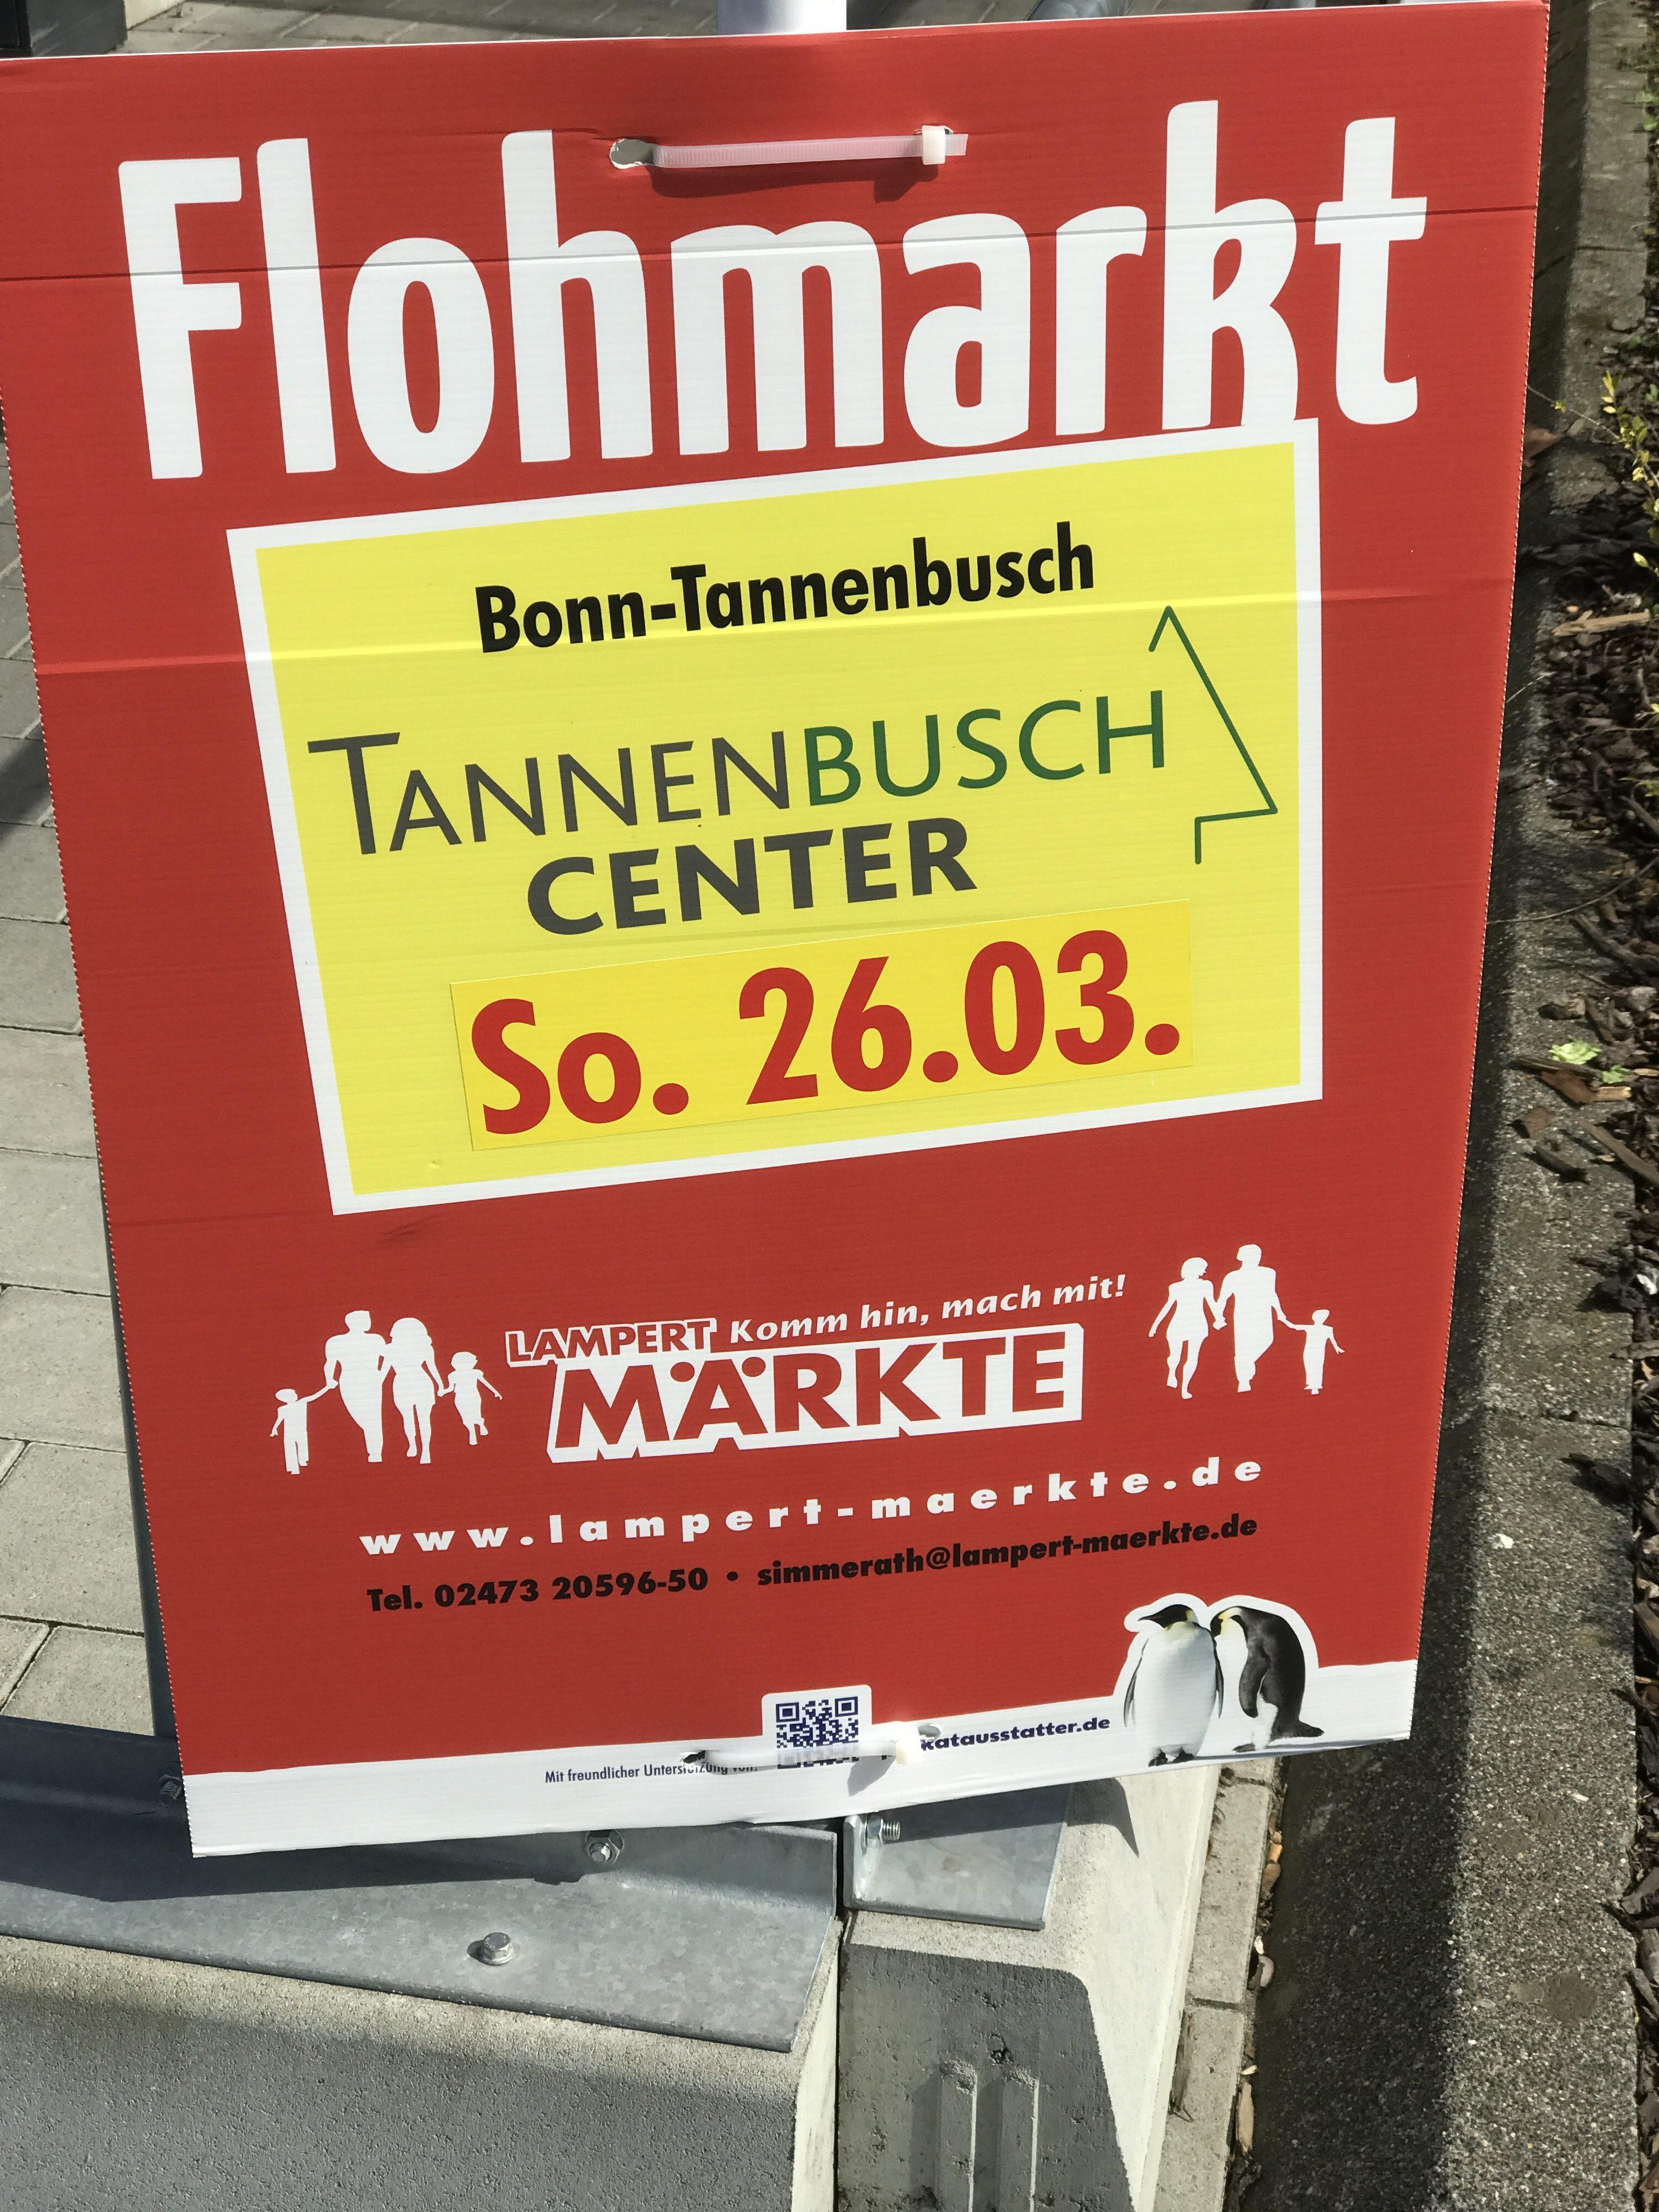 Flohmarkt am 26. März 2017